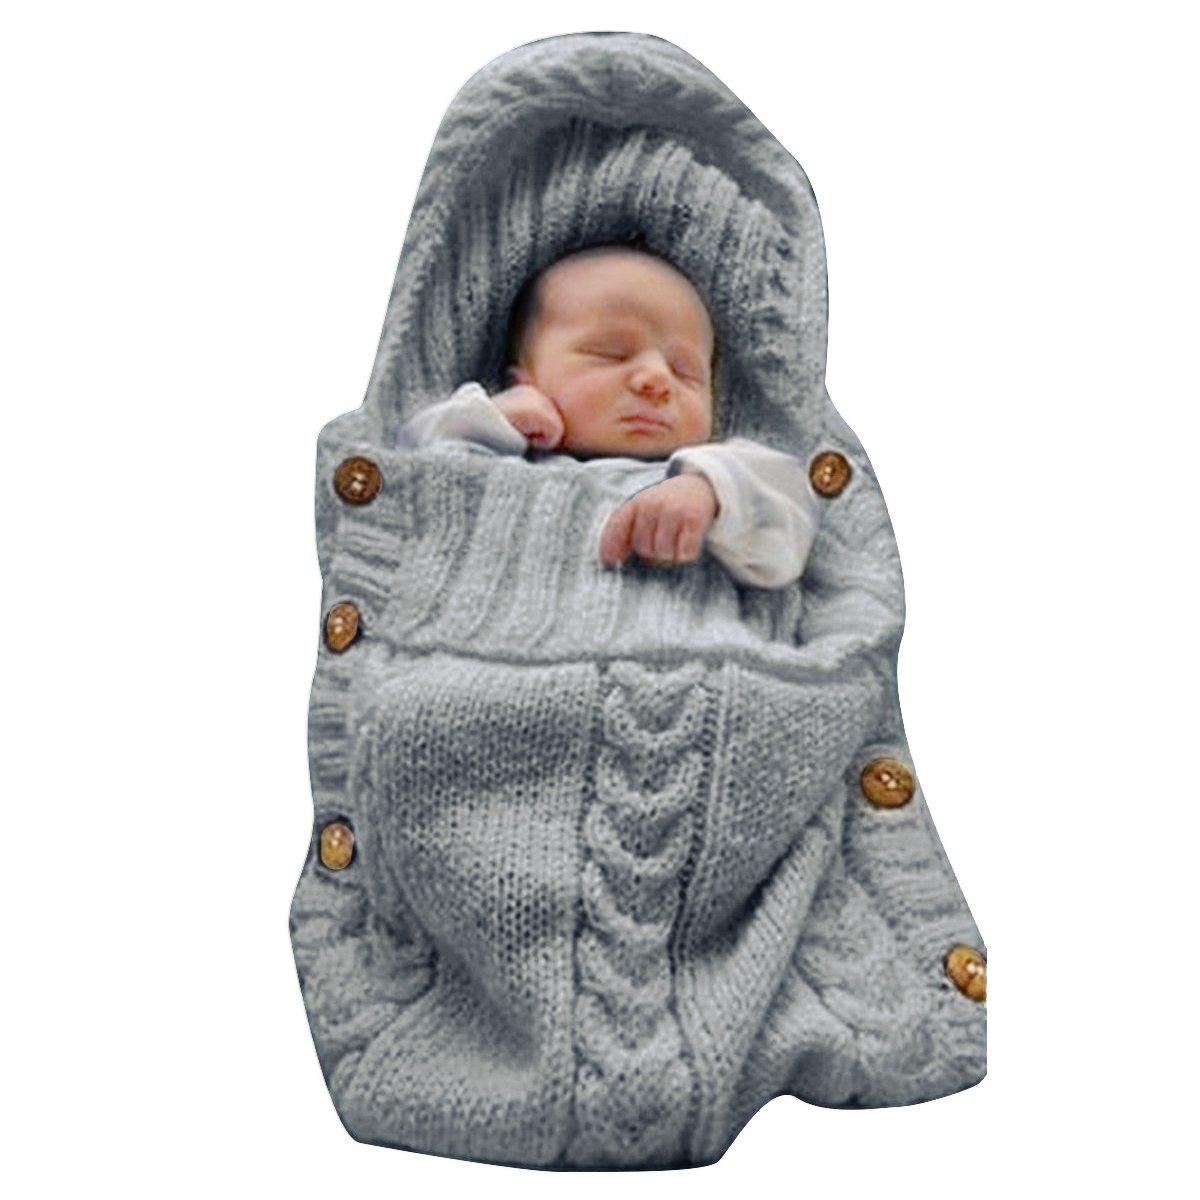 XMWEALTHY Newborn Baby Wrap Swaddle Blanket Knit Sleeping Bag Sleep Sack Stroller Wrap for Baby(Dark gray) (0-6 Month)